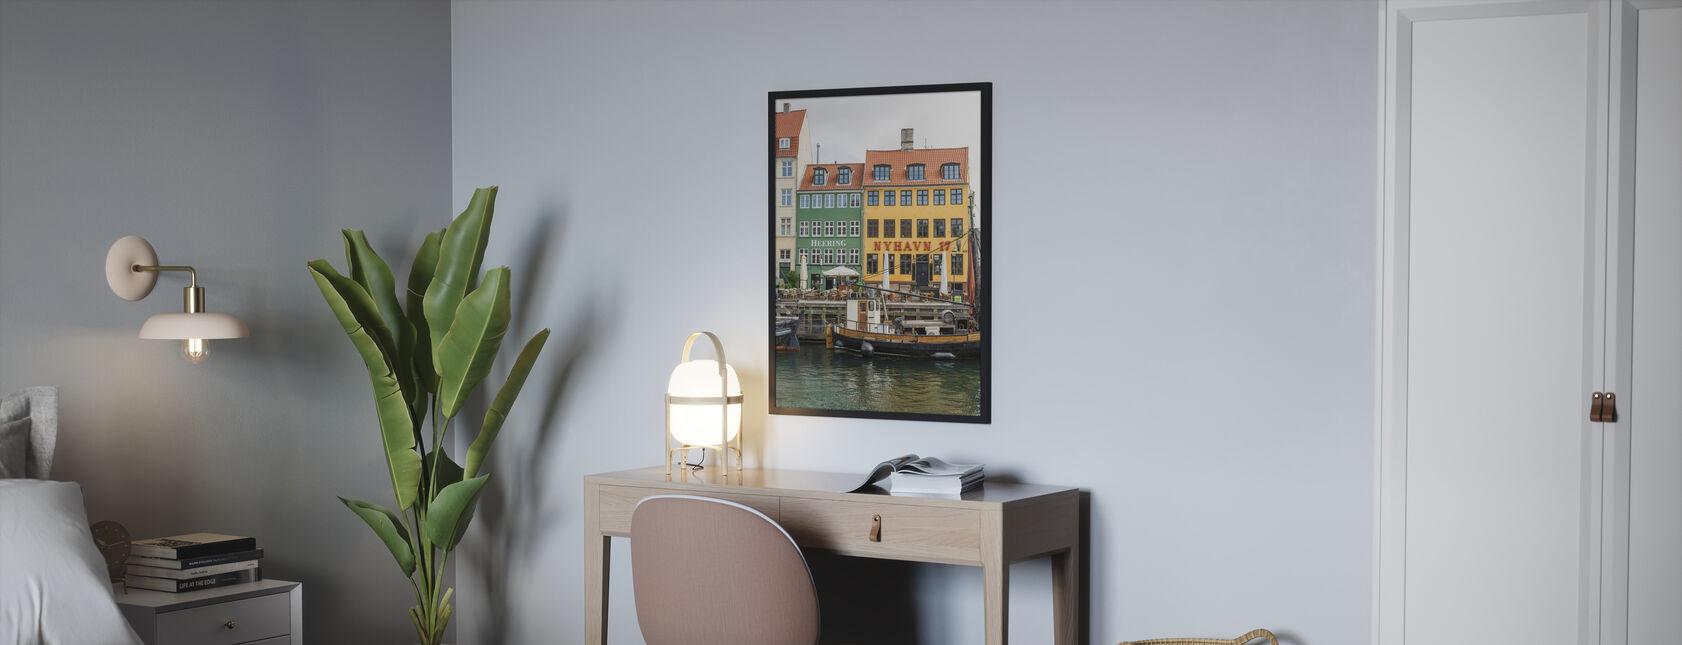 Nyhavn 17, Kopenhagen, Dänemark - Poster - Schlafzimmer